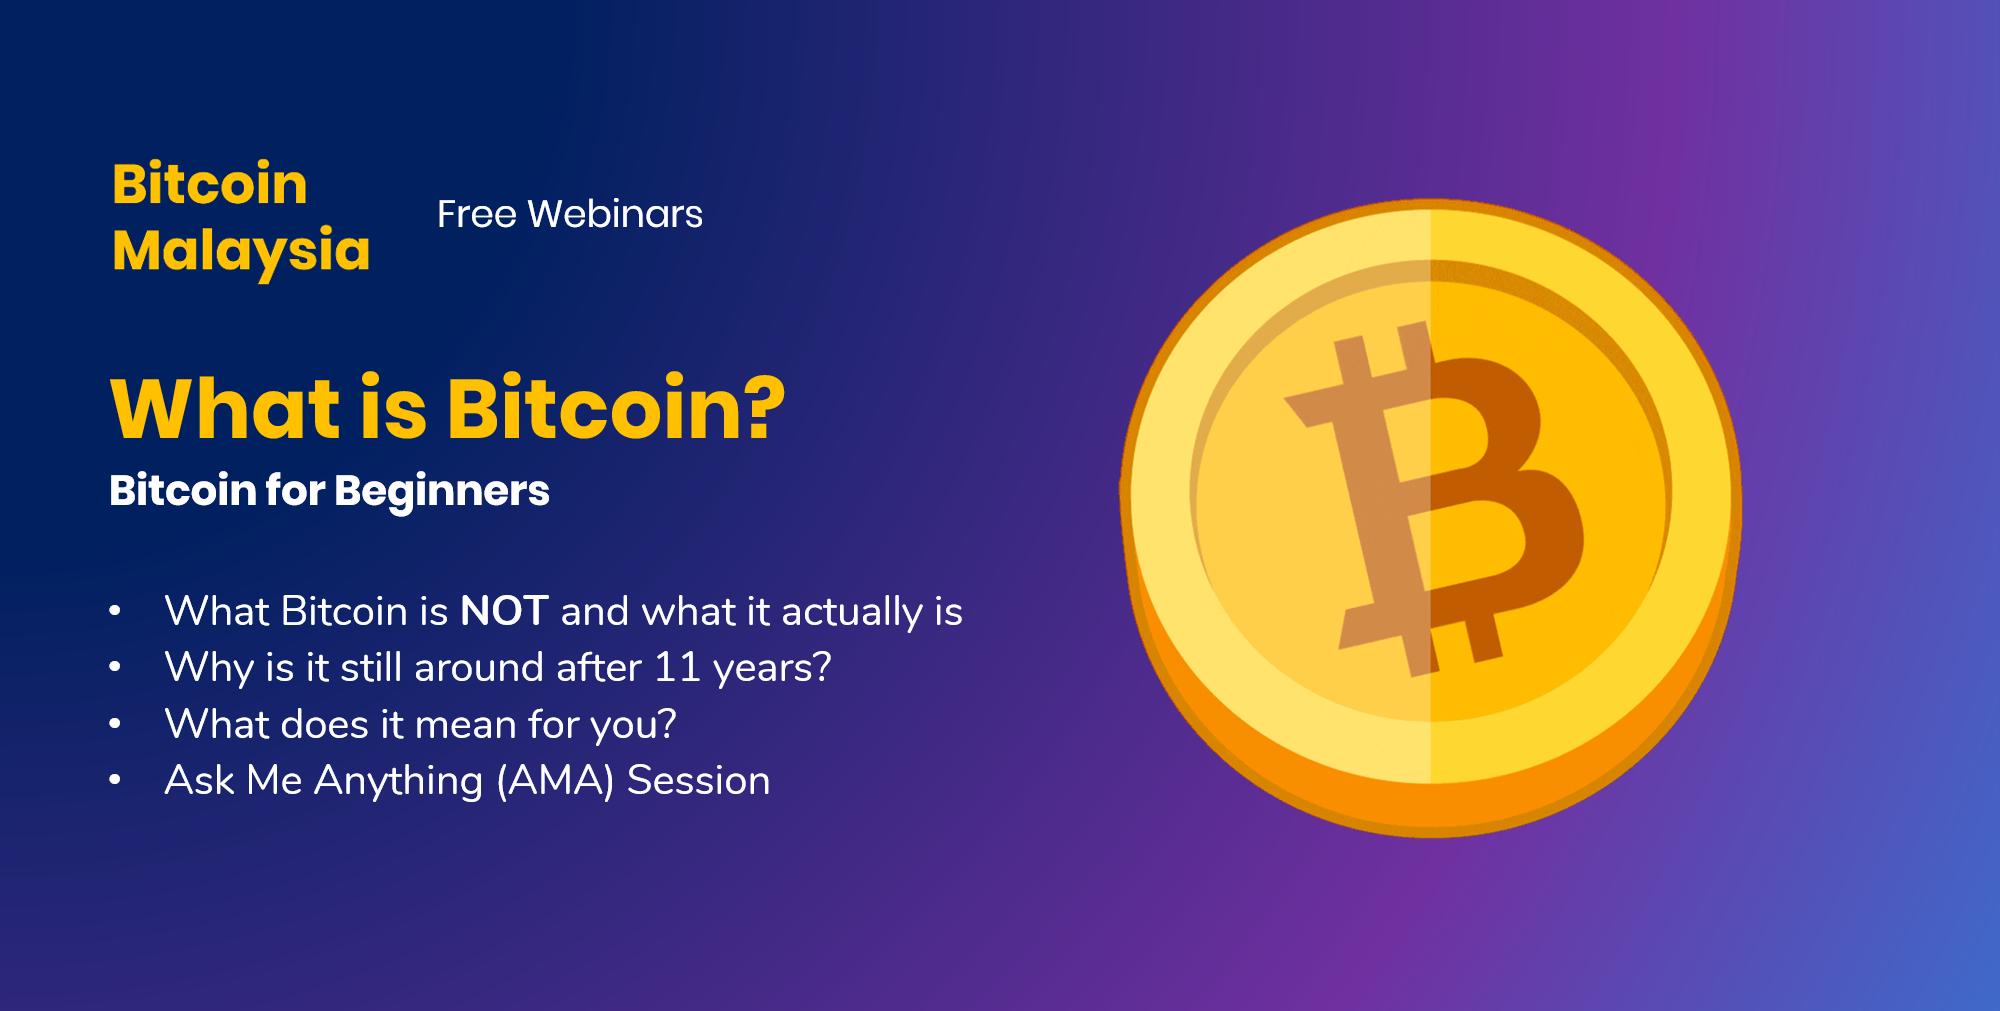 bitcoin beginner webinars.png